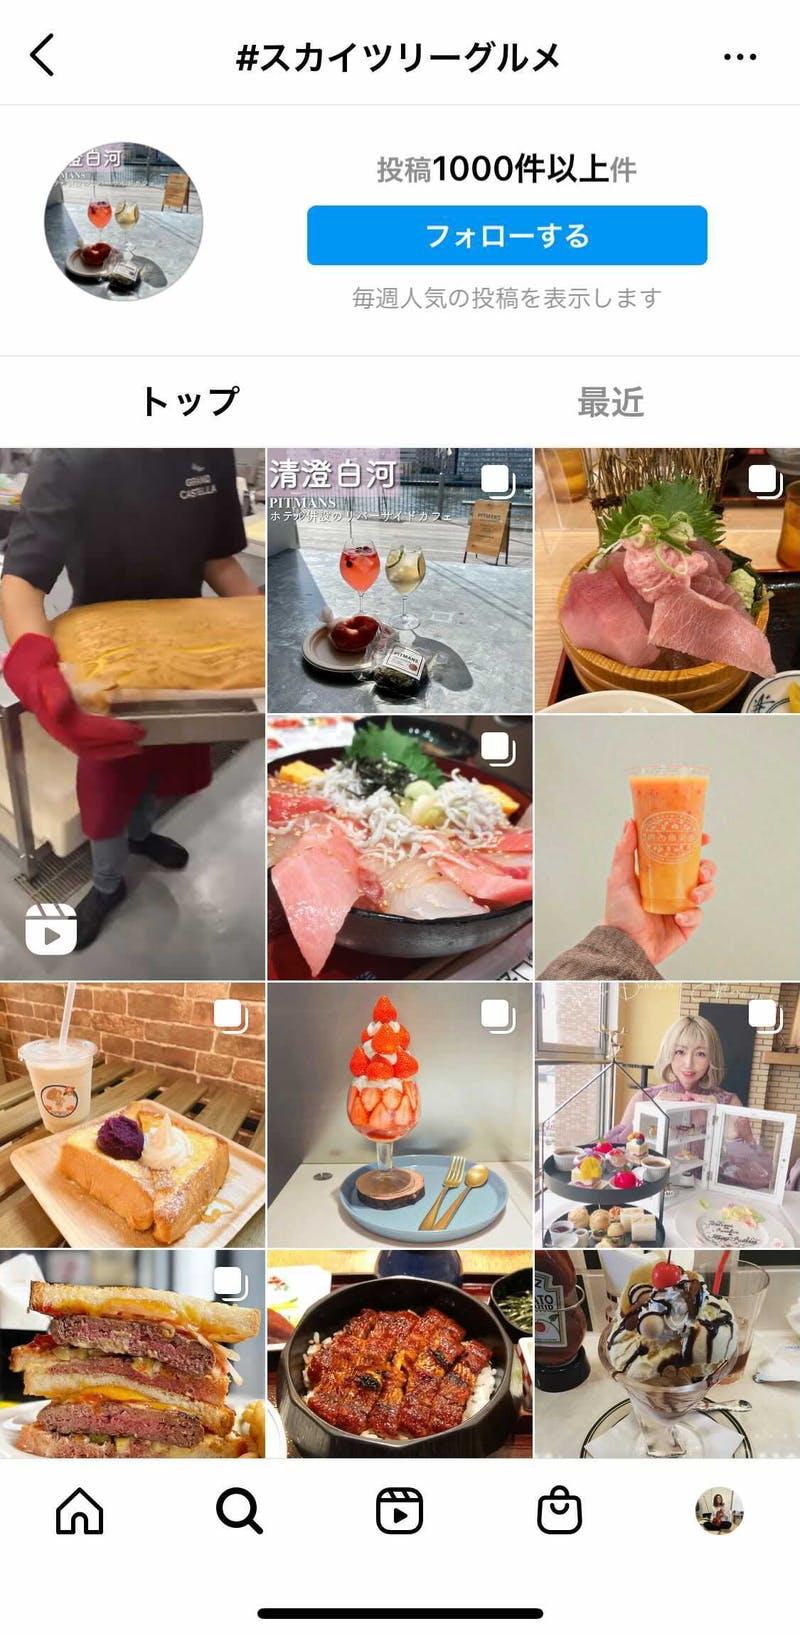 Instagramでの「スカイツリーグルメ」の検索結果画面